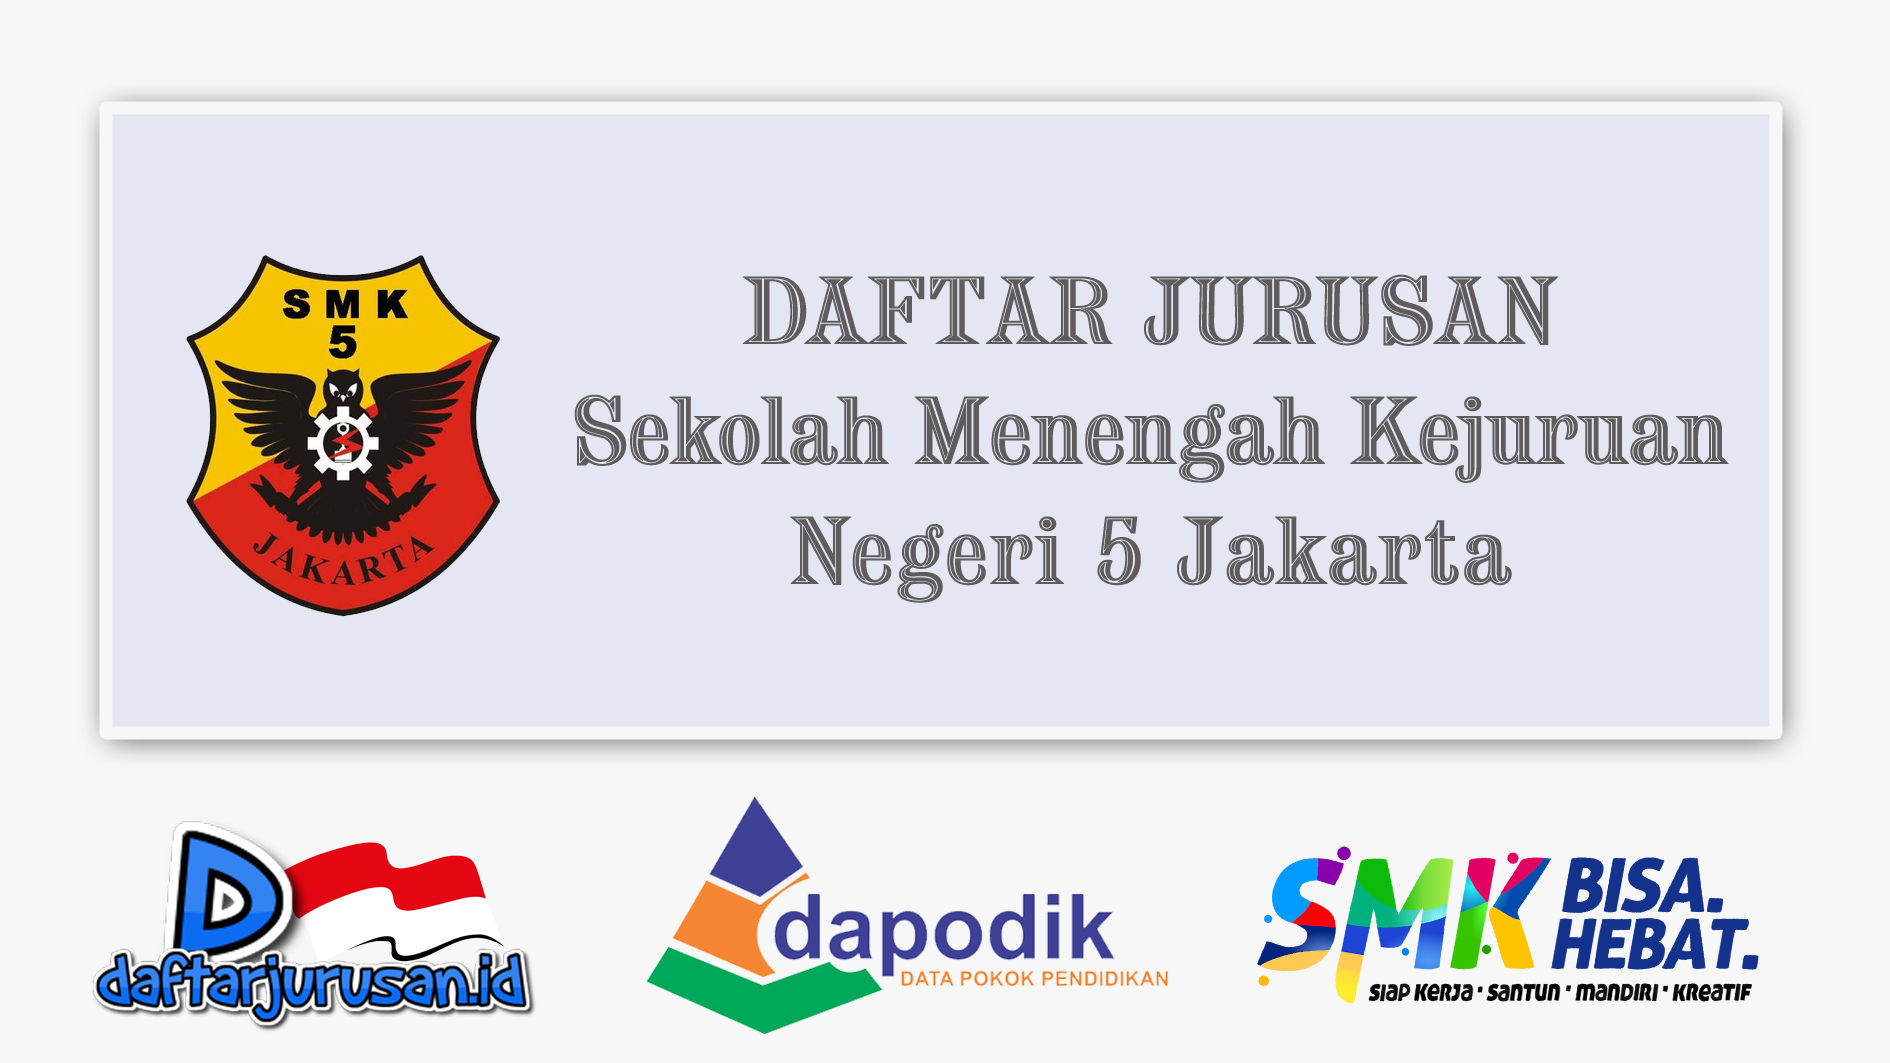 Daftar Jurusan SMK Negeri 5 Jakarta Timur